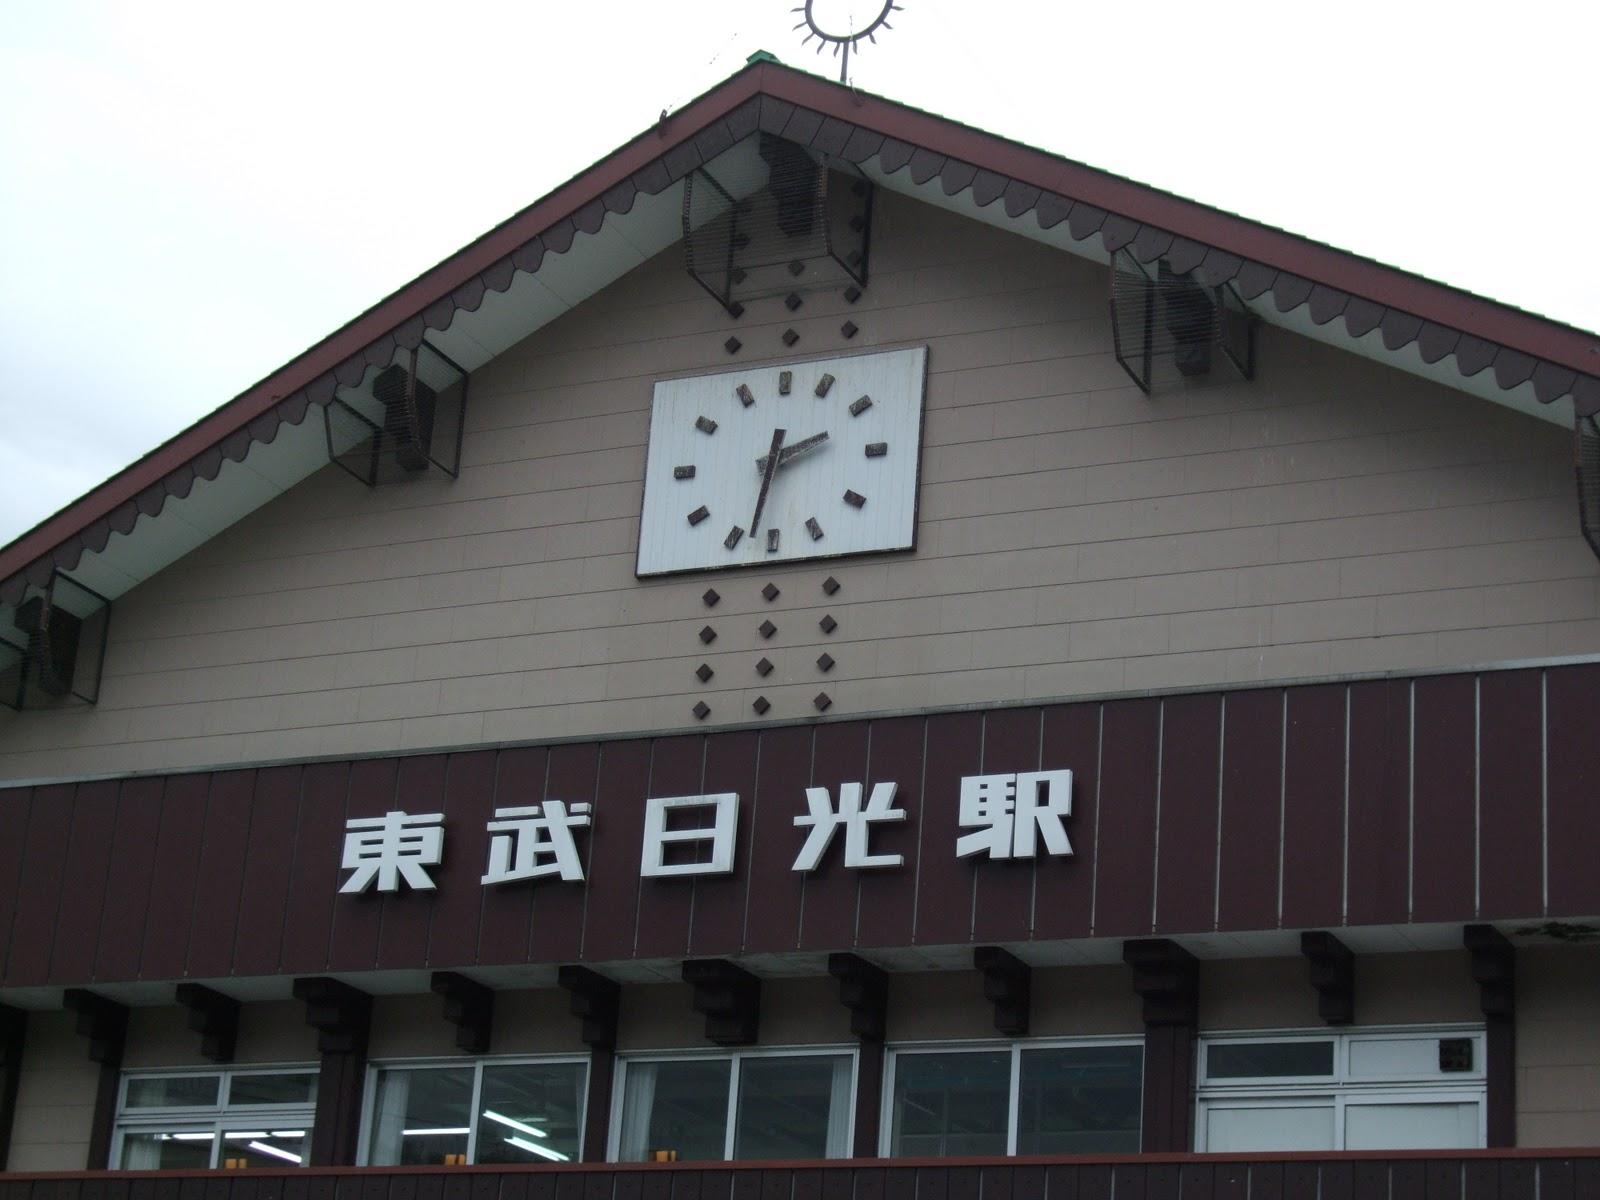 Un garçon voyageant: 日光・鬼怒川温泉 Un ga... Un garçon